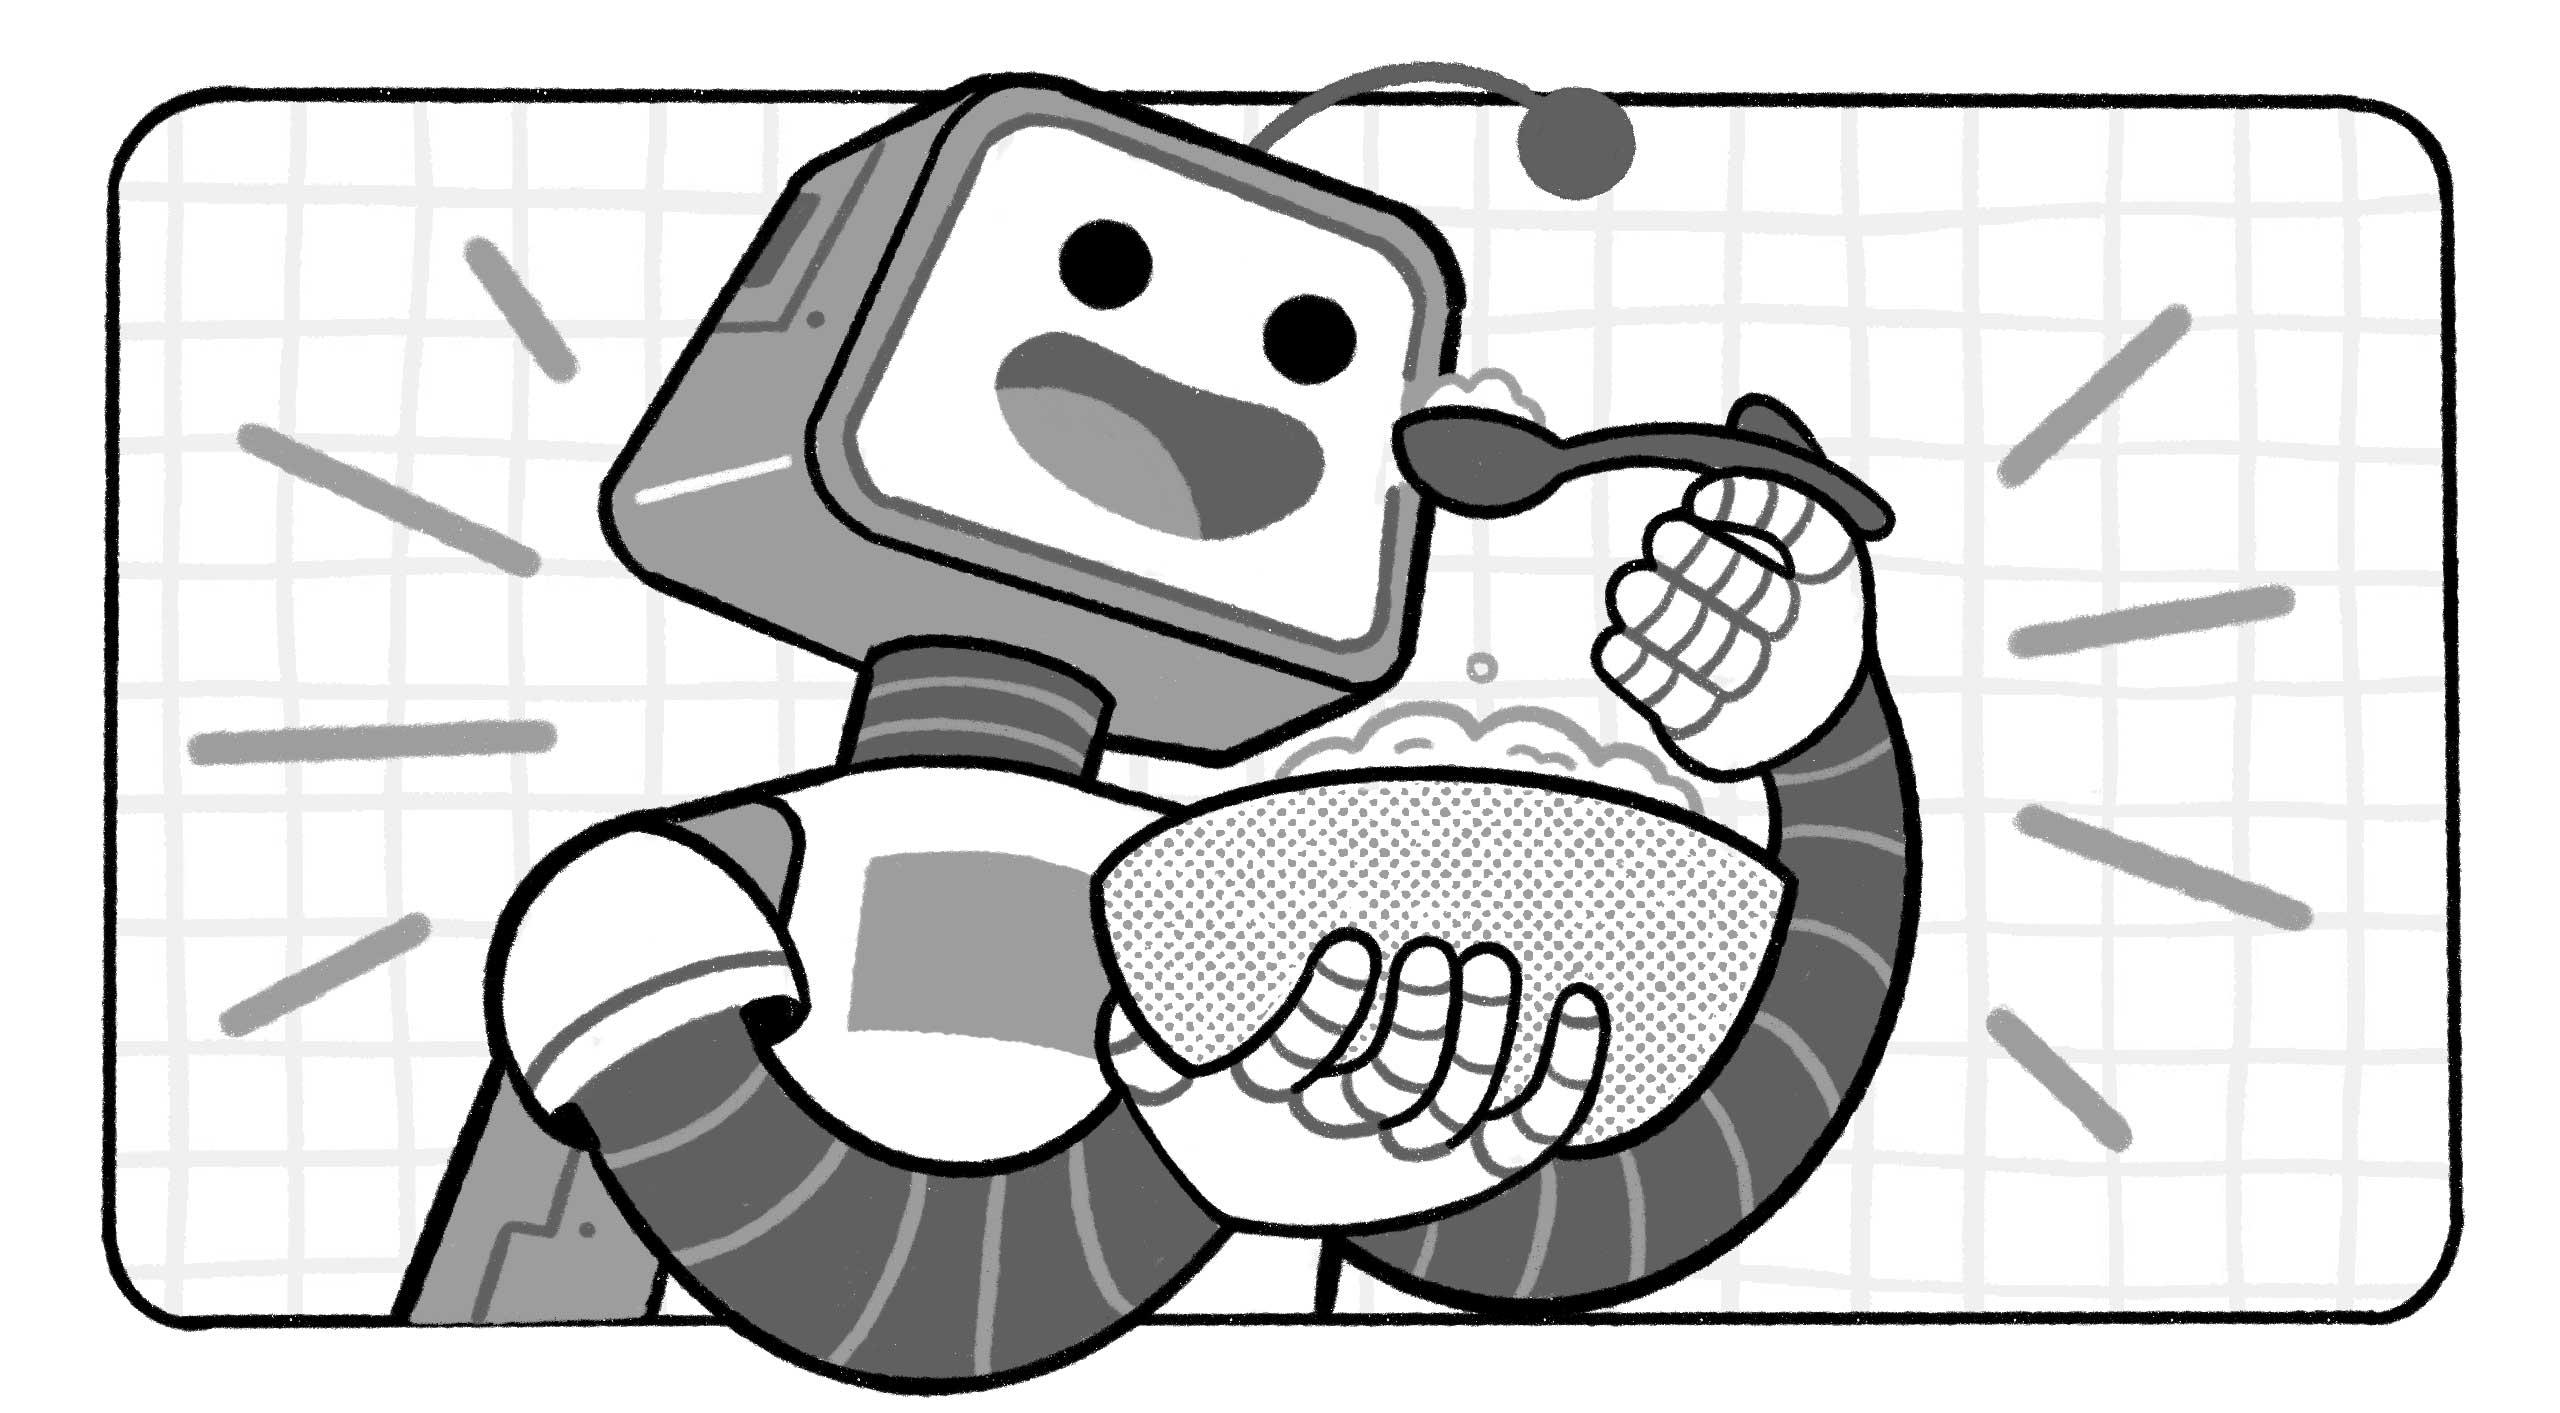 a robot eating food